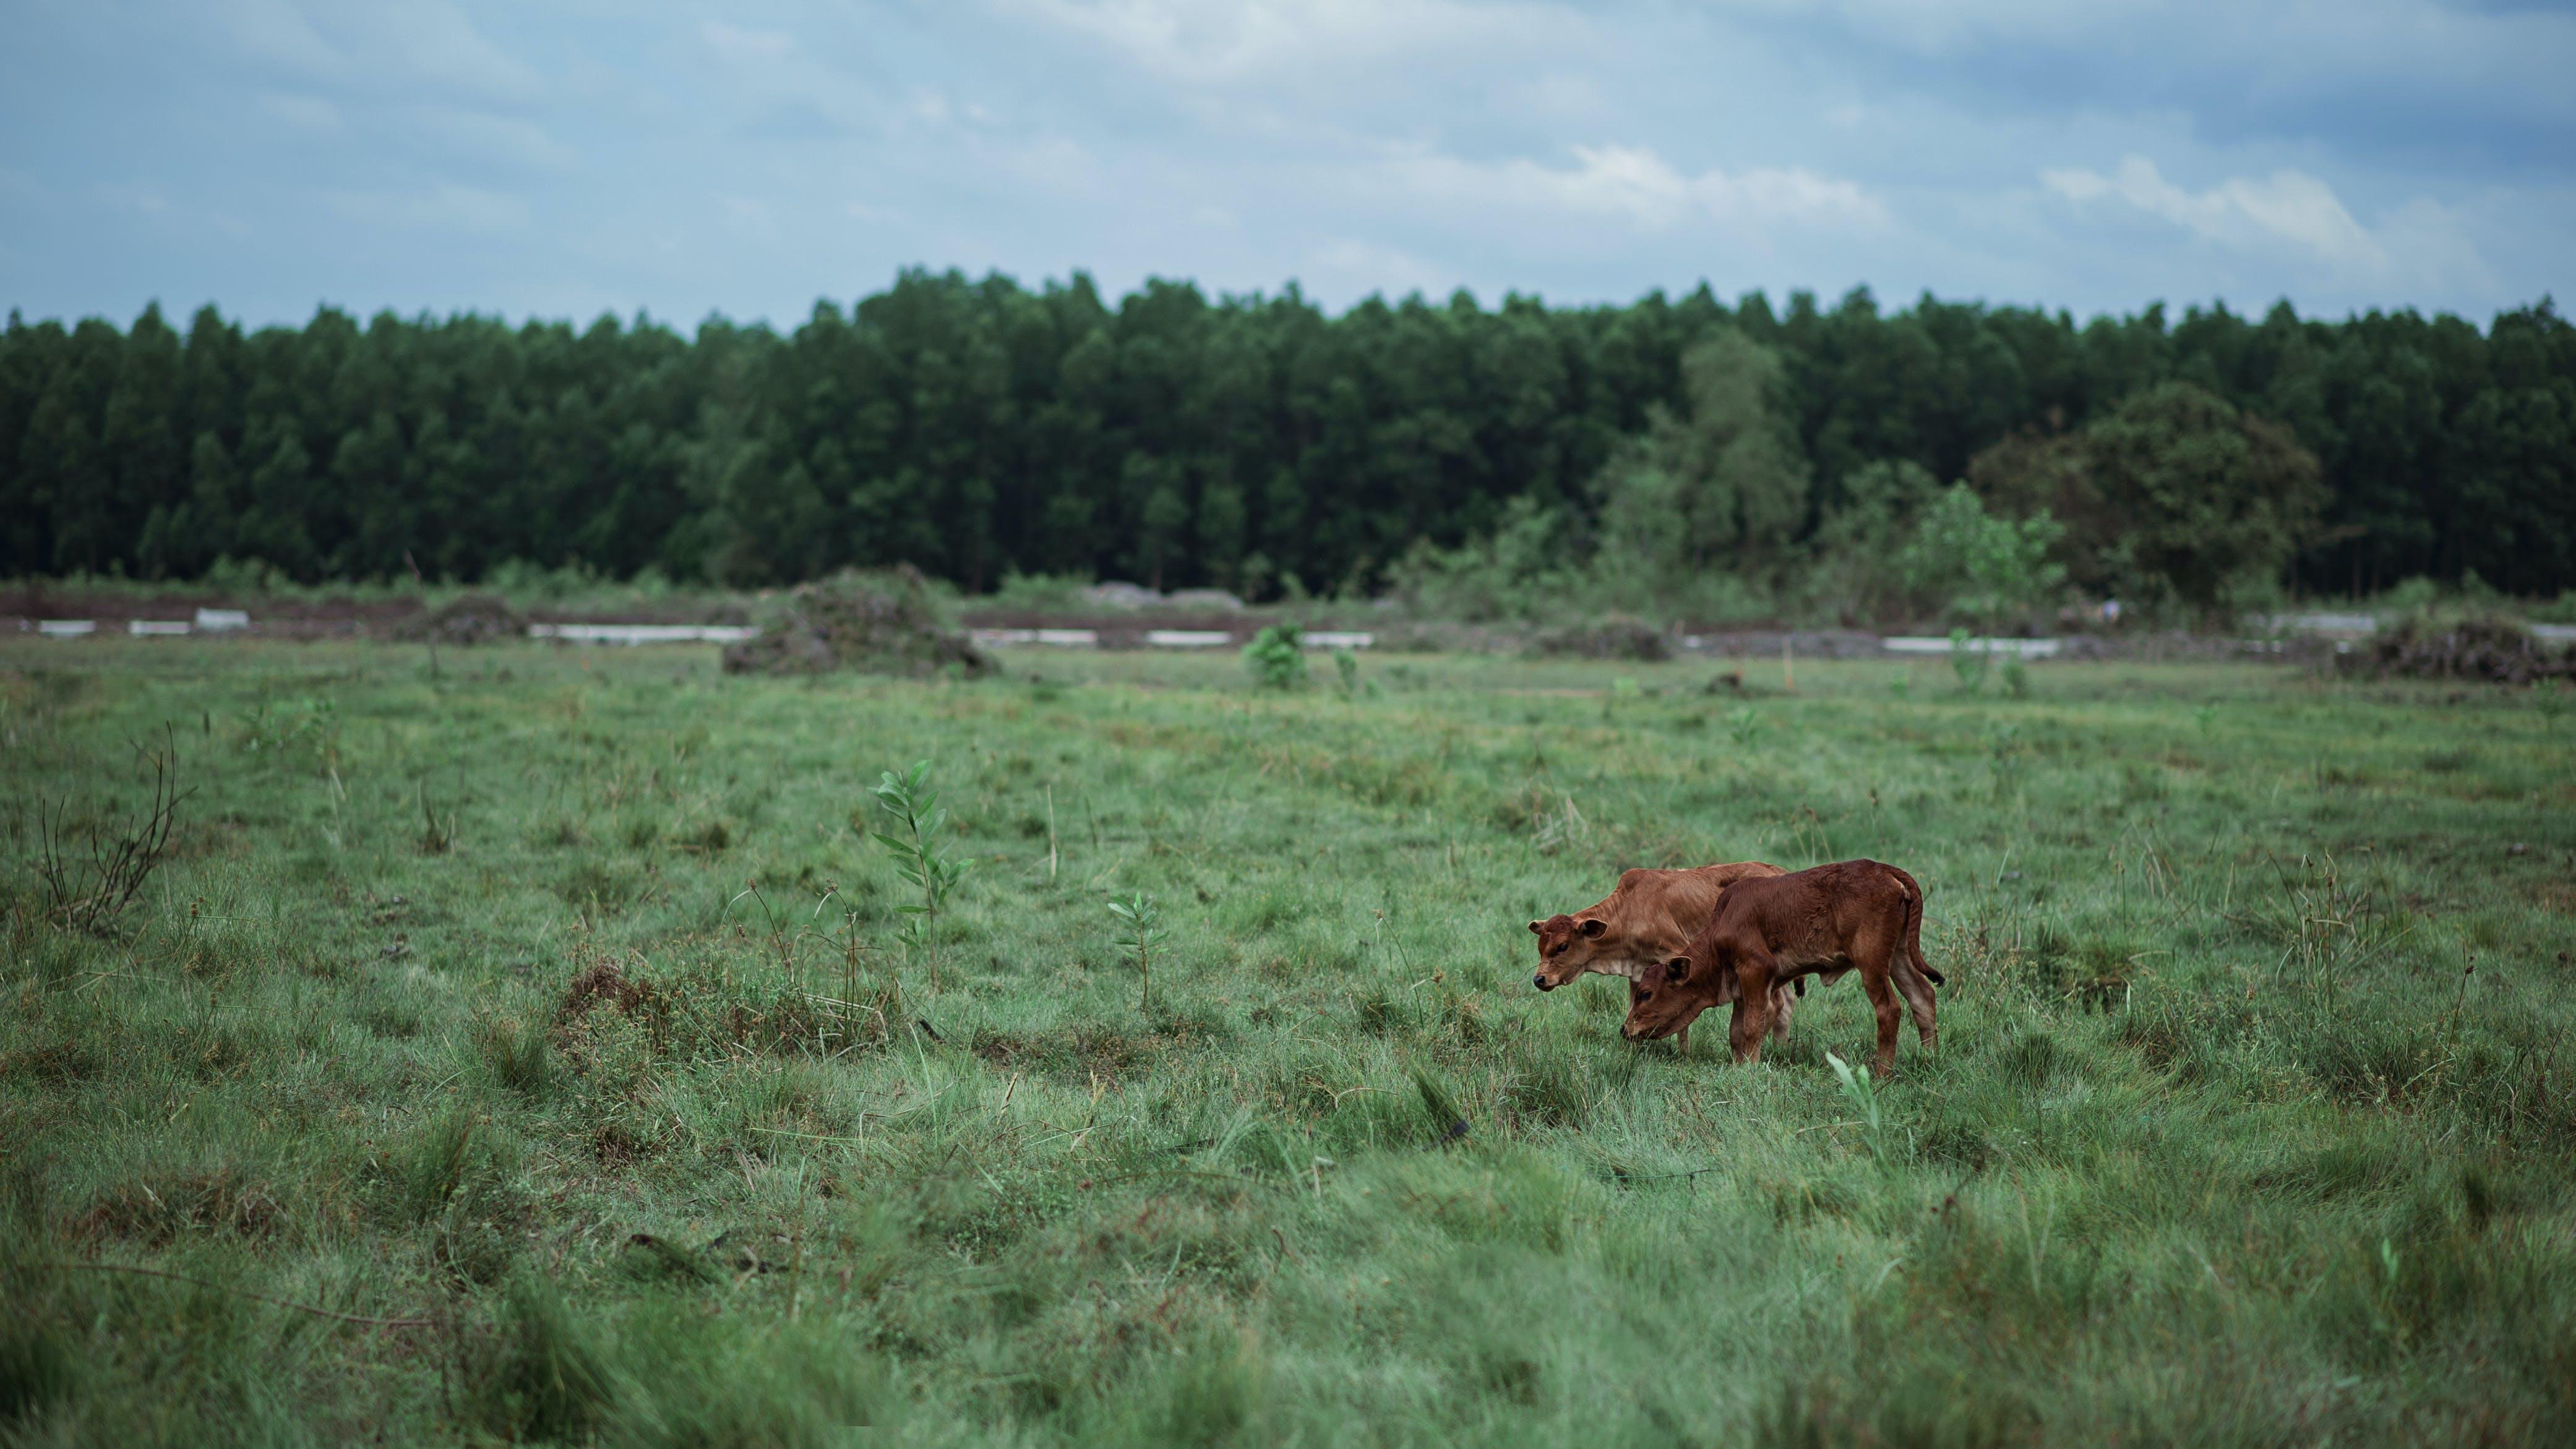 Brown Cattle on Green Grass Field